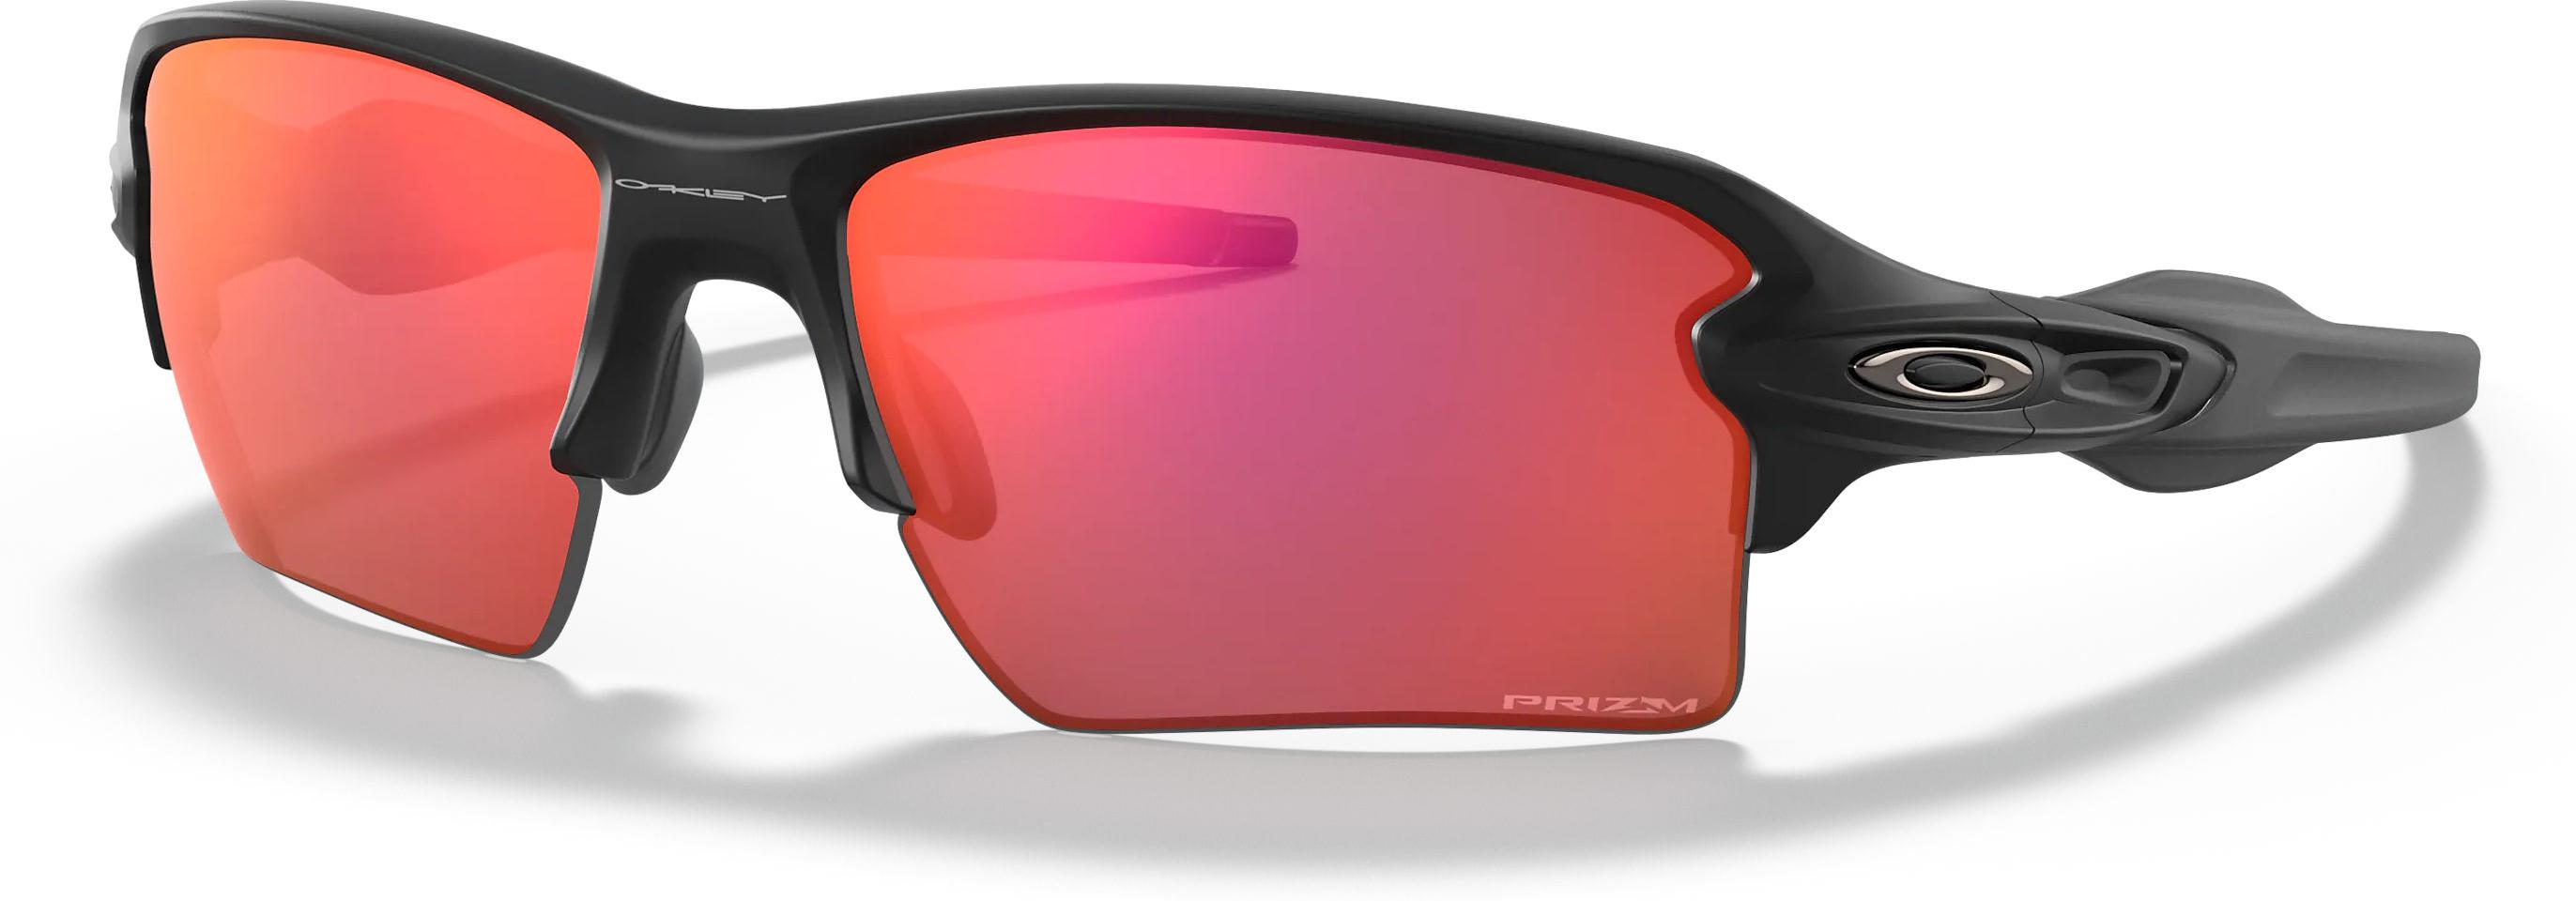 Sunglasses Oakley Flak 2.0 XL MttBlk w/ PRIZM Trail Torch - Top4Running.com